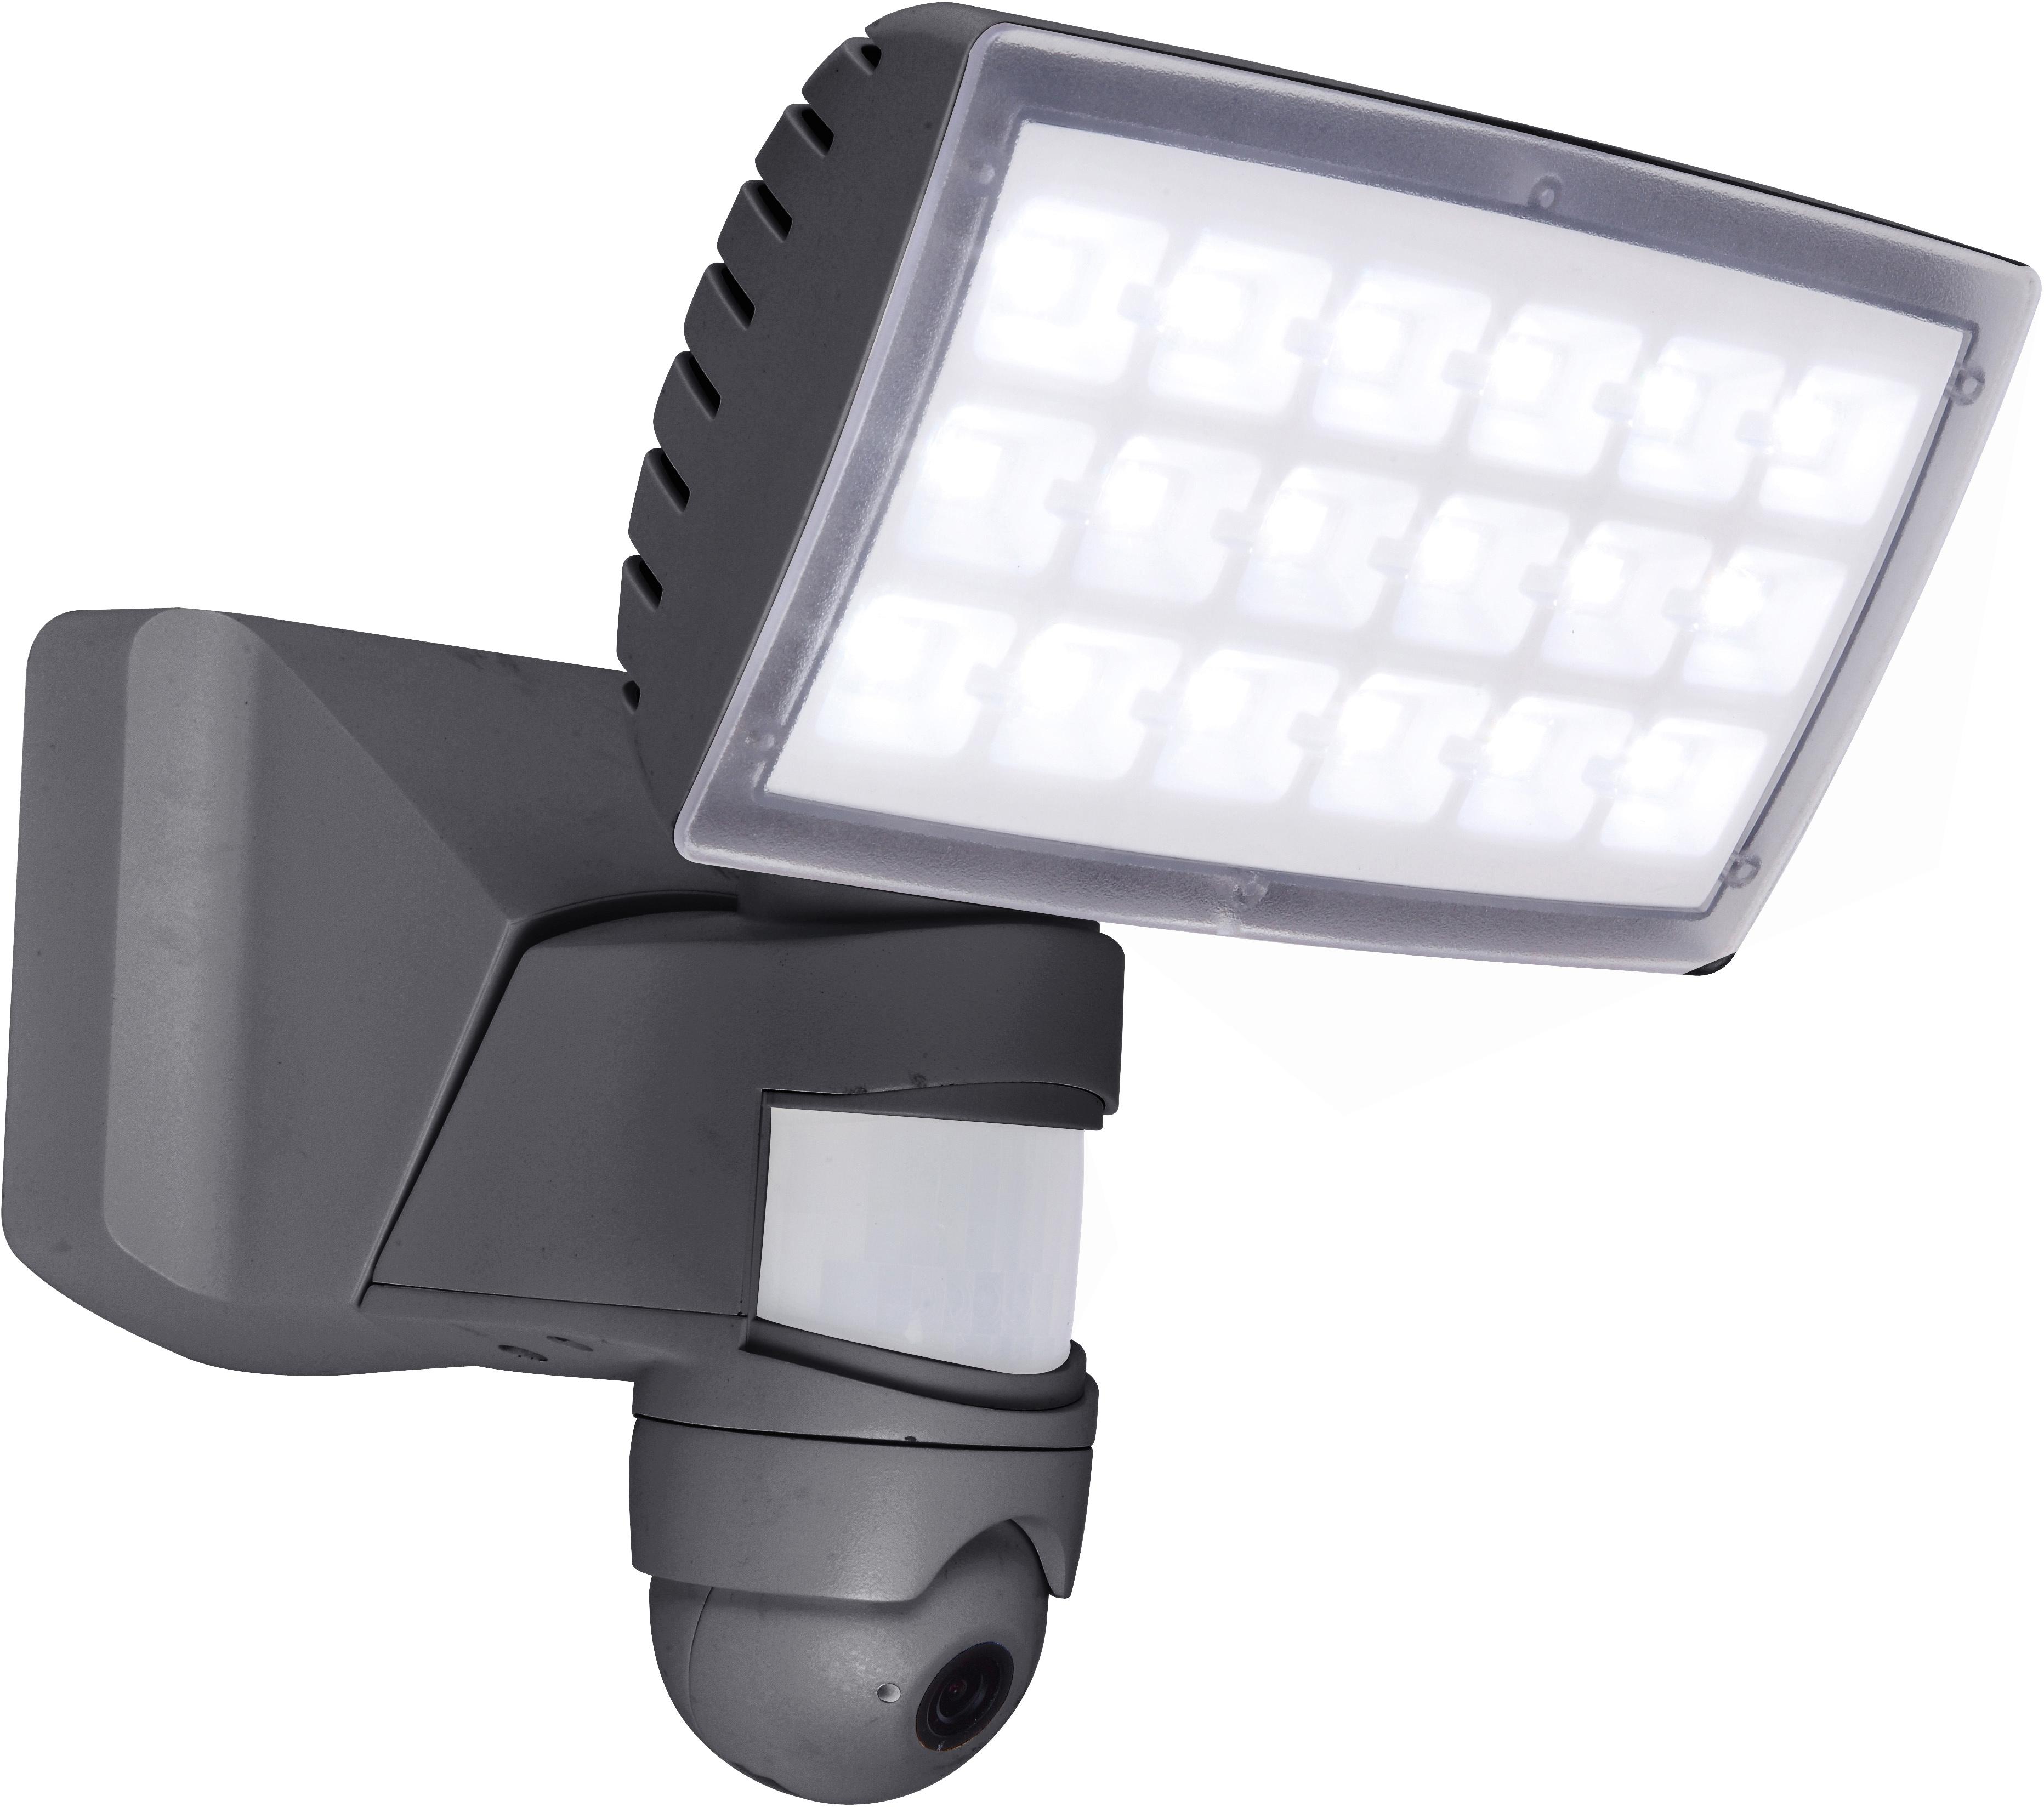 LUTEC LED Außen-Wandleuchte PERI HD 6295-CAM GR, LED-Modul, 1 St., Neutralweiß, Kameraleuchte